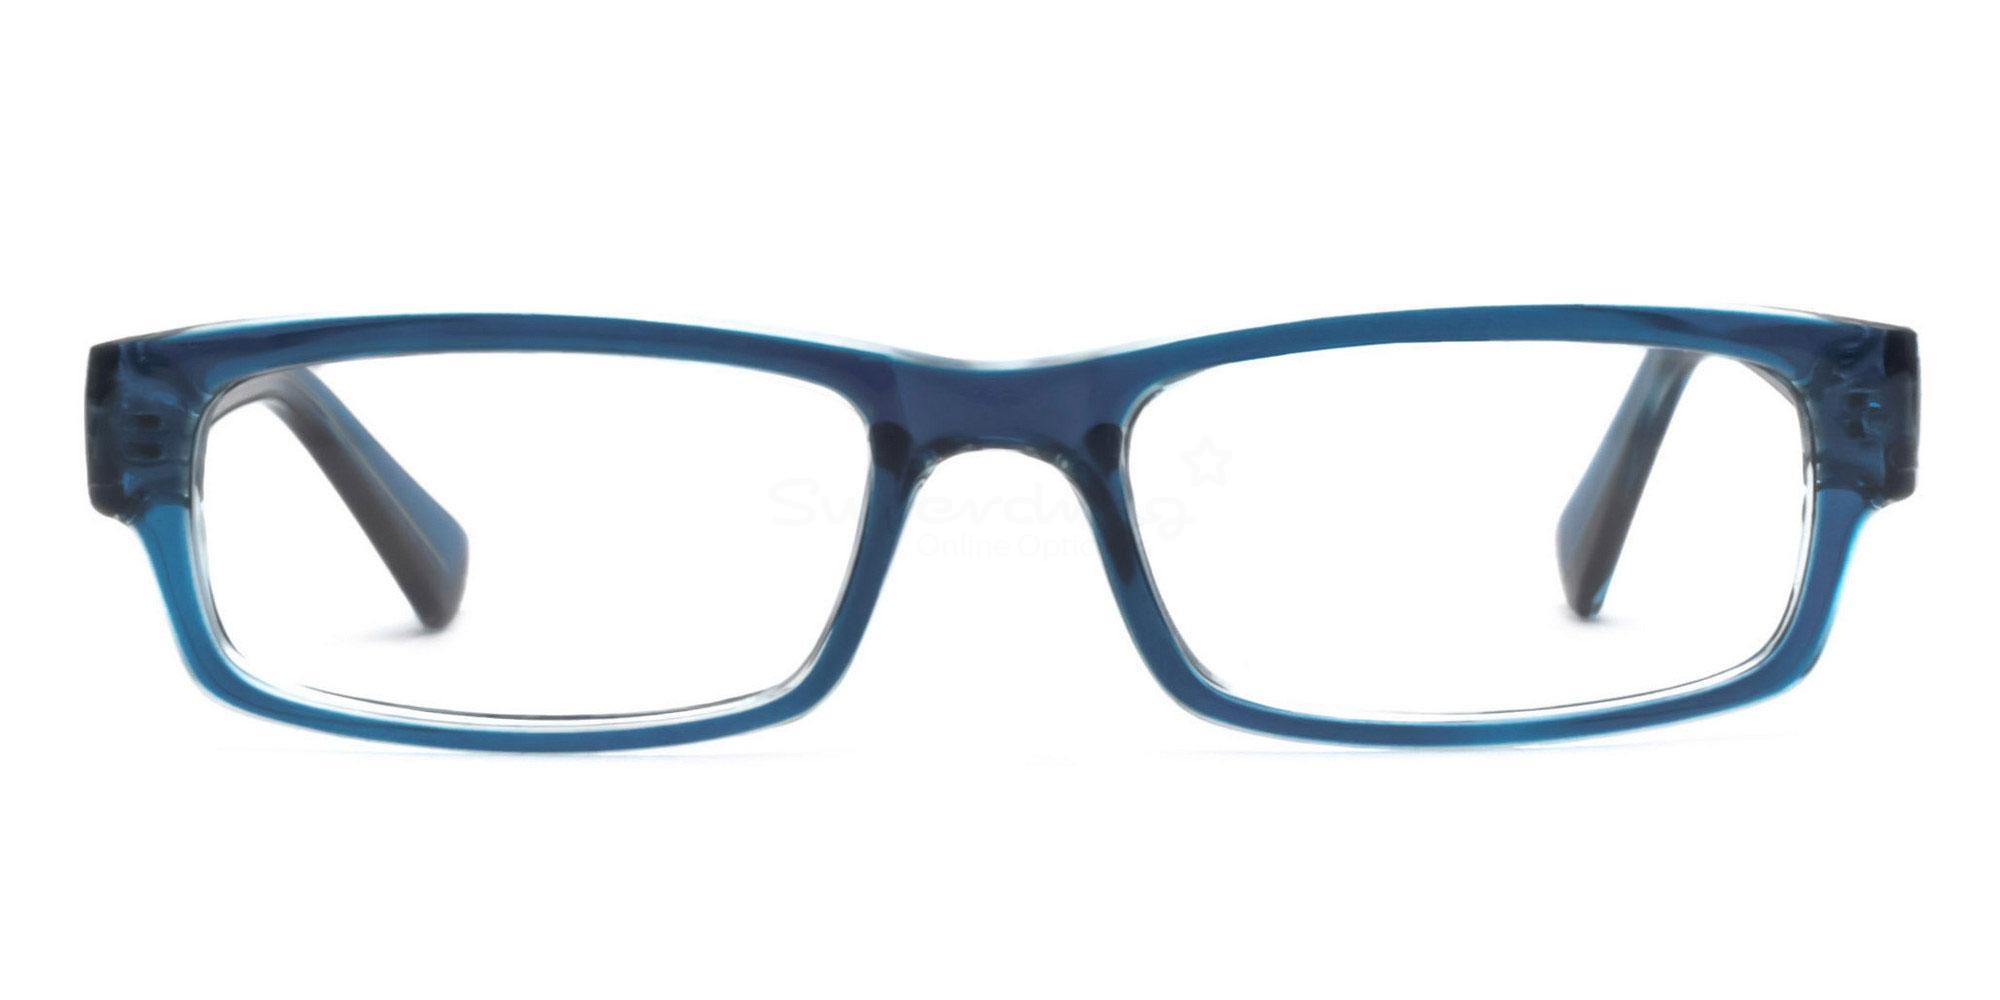 C6 Blue 77063 (Blue) Glasses, Helium